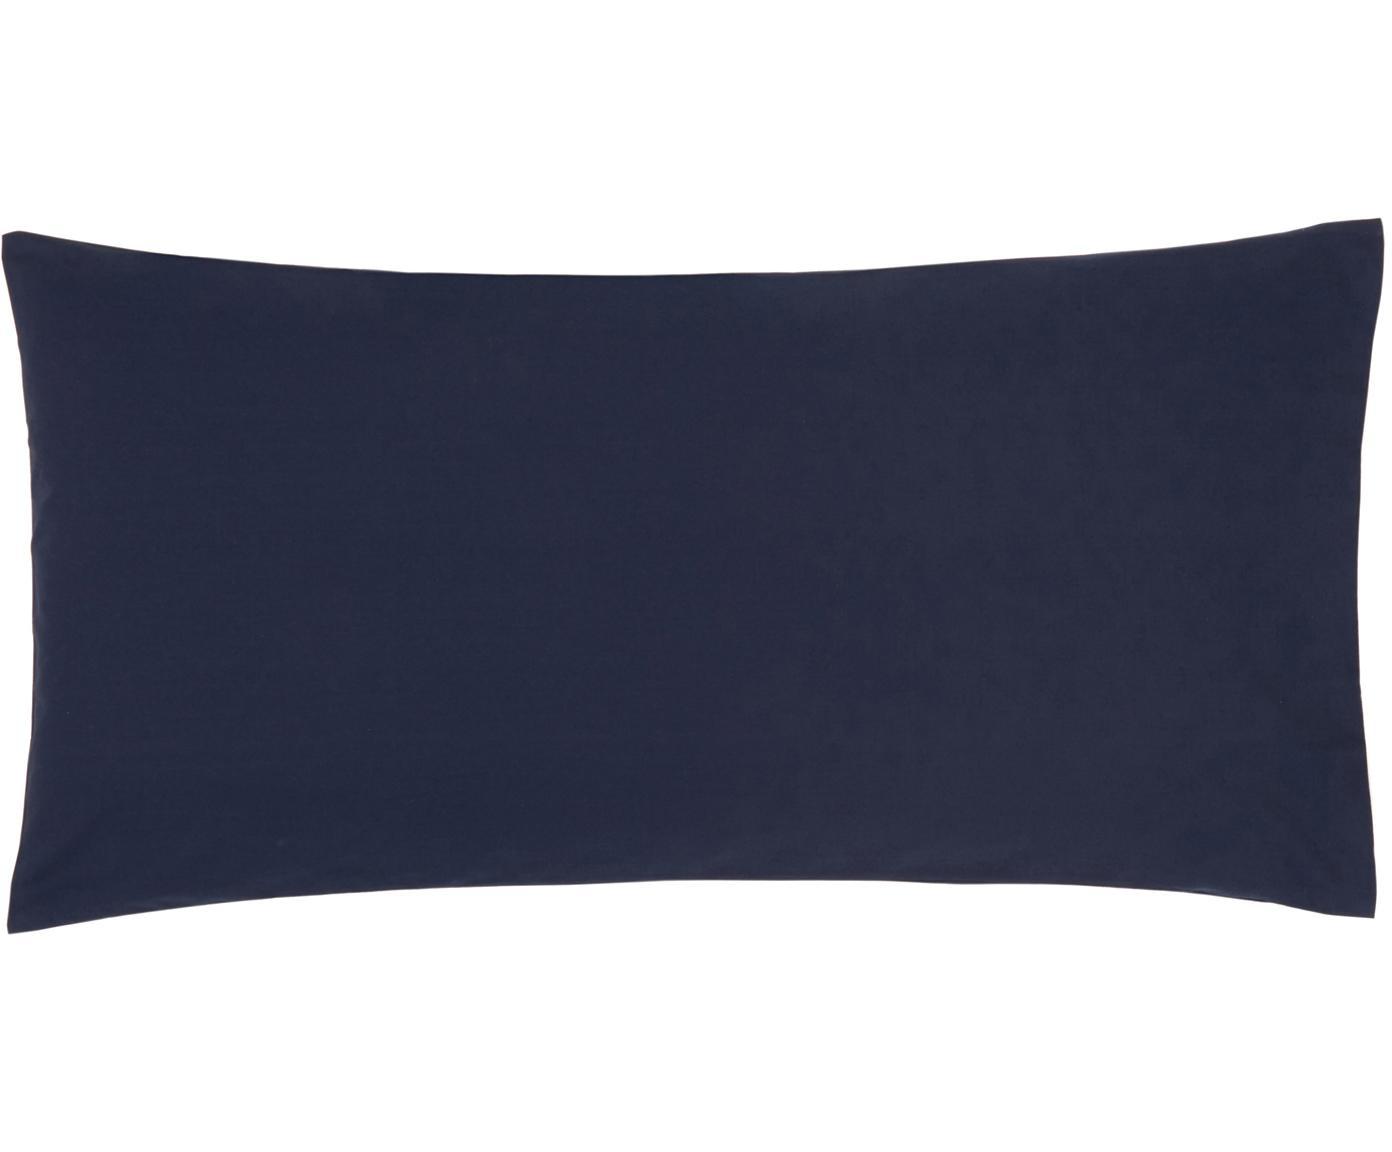 Baumwollperkal-Kissenbezüge Elsie in Dunkelblau, 2 Stück, Webart: Perkal Fadendichte 200 TC, Dunkelblau, 40 x 80 cm